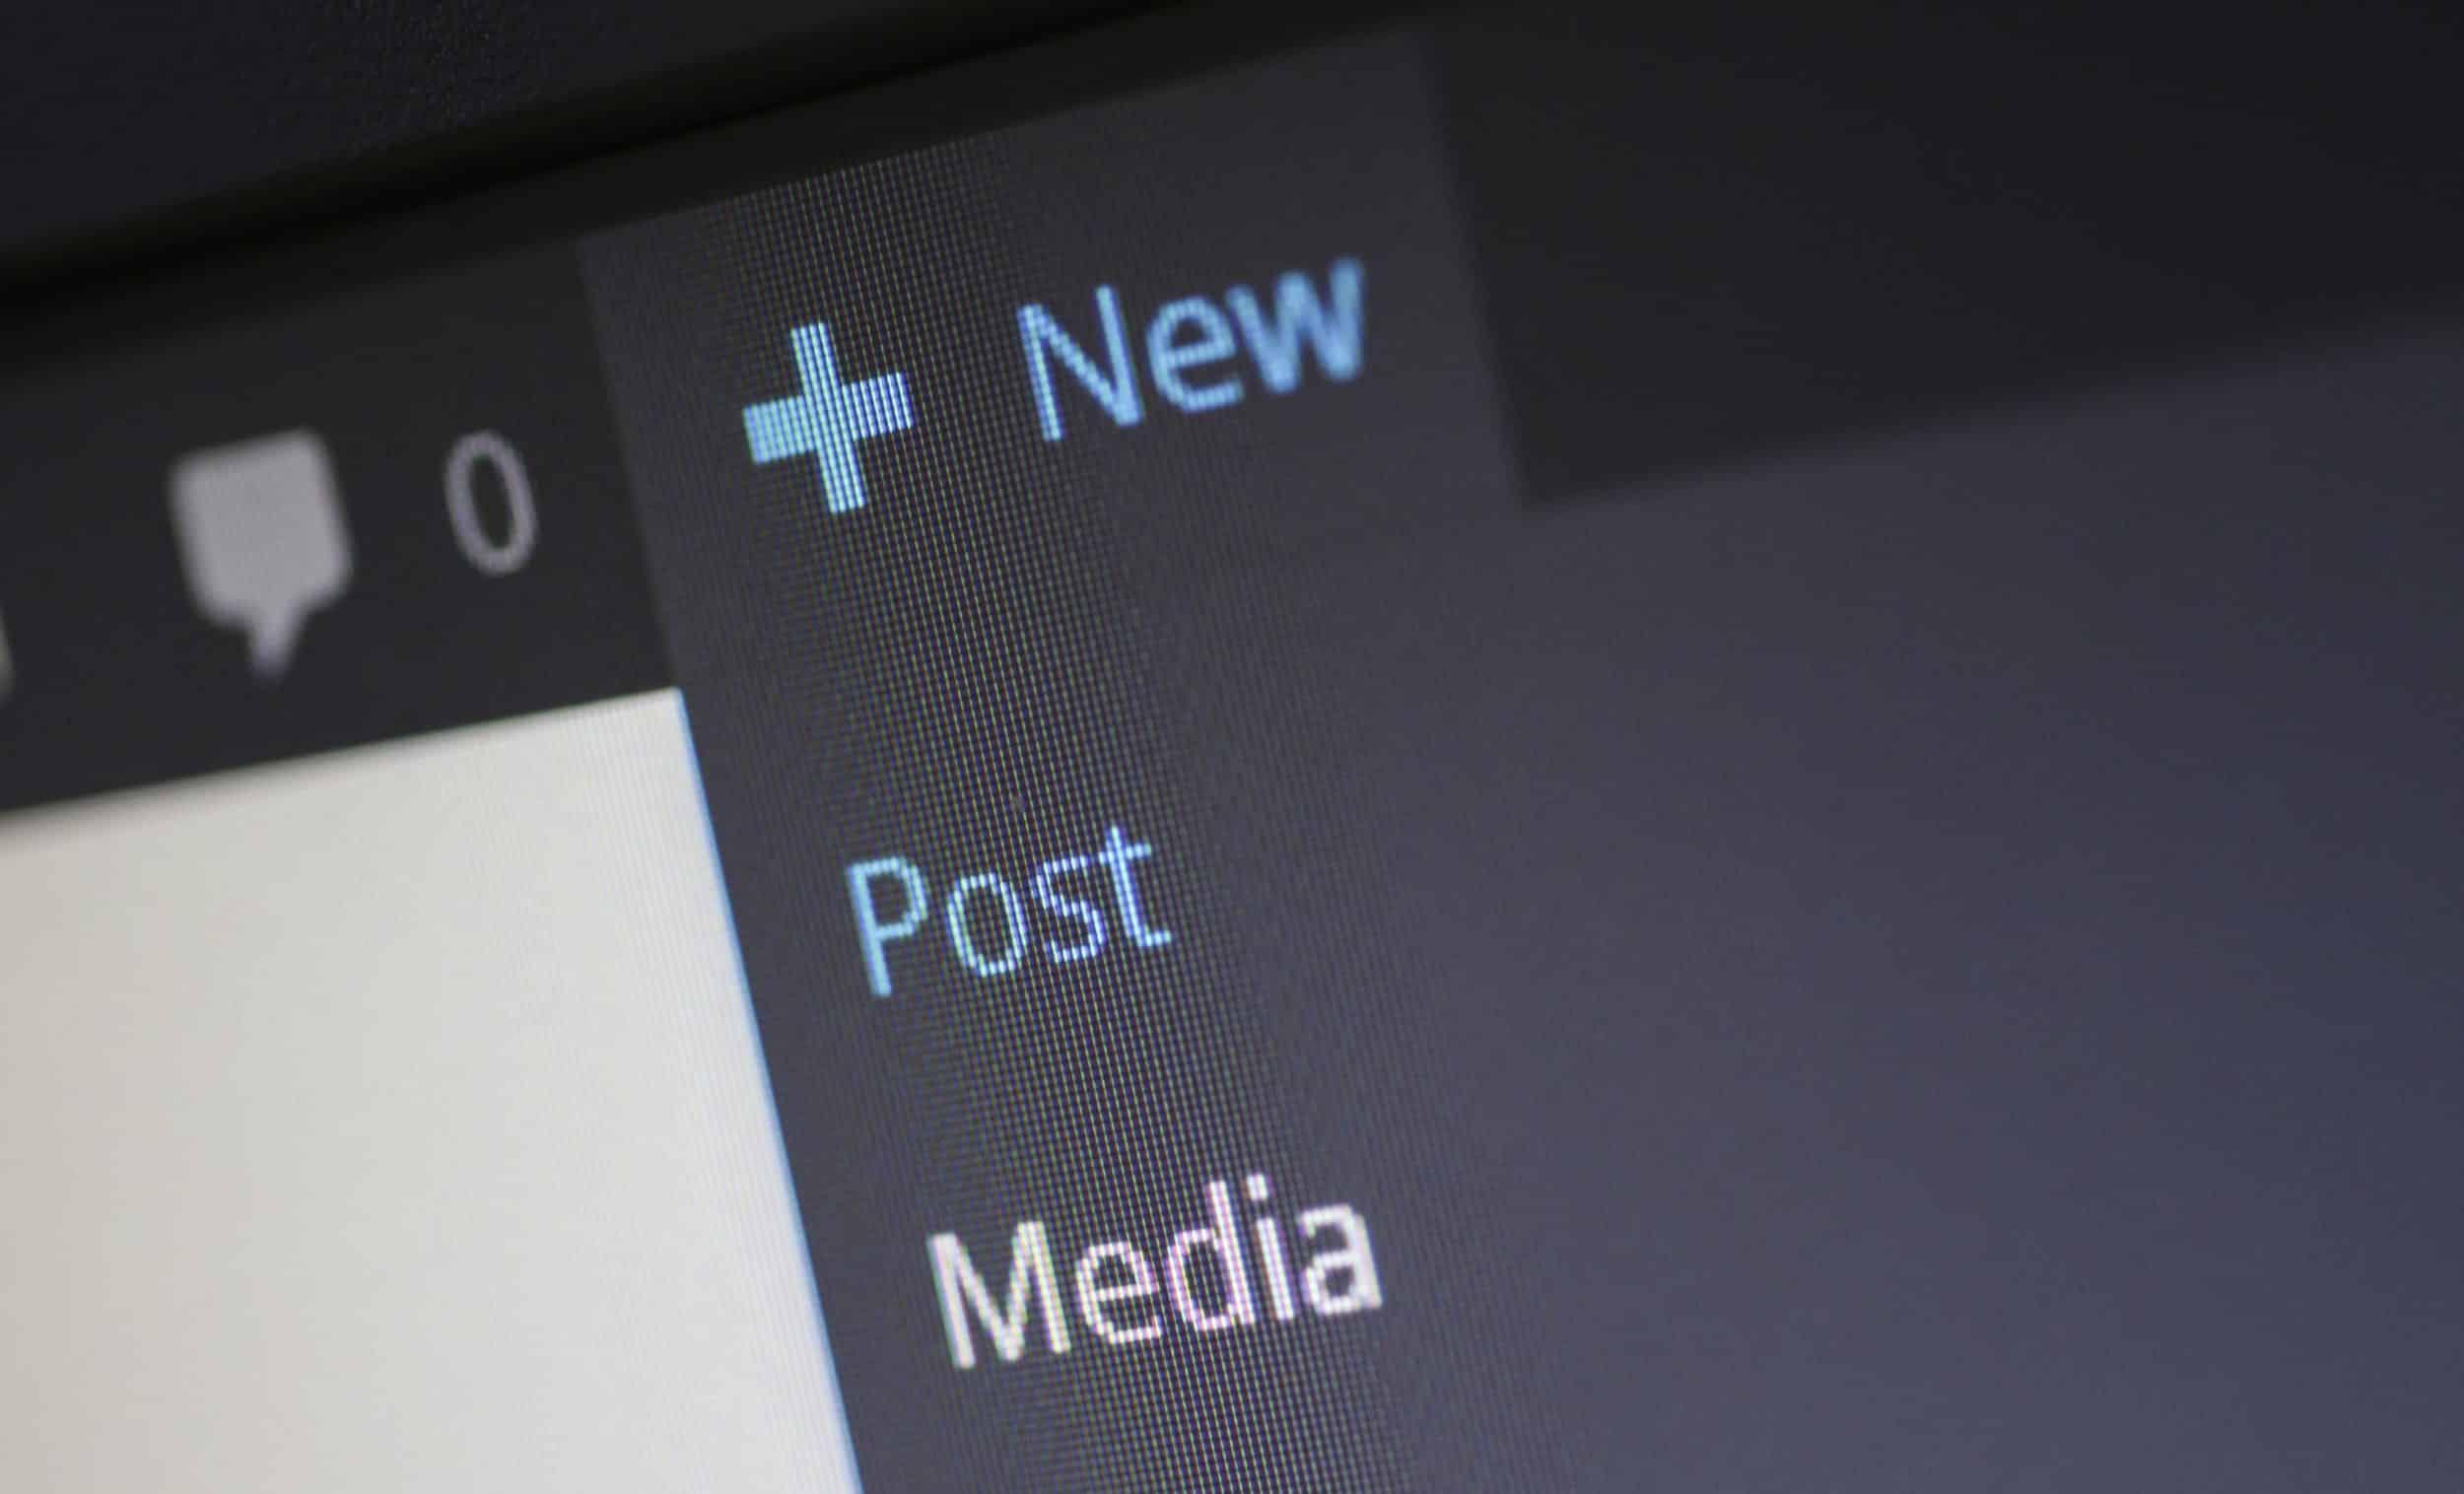 legal blog writing - blog image